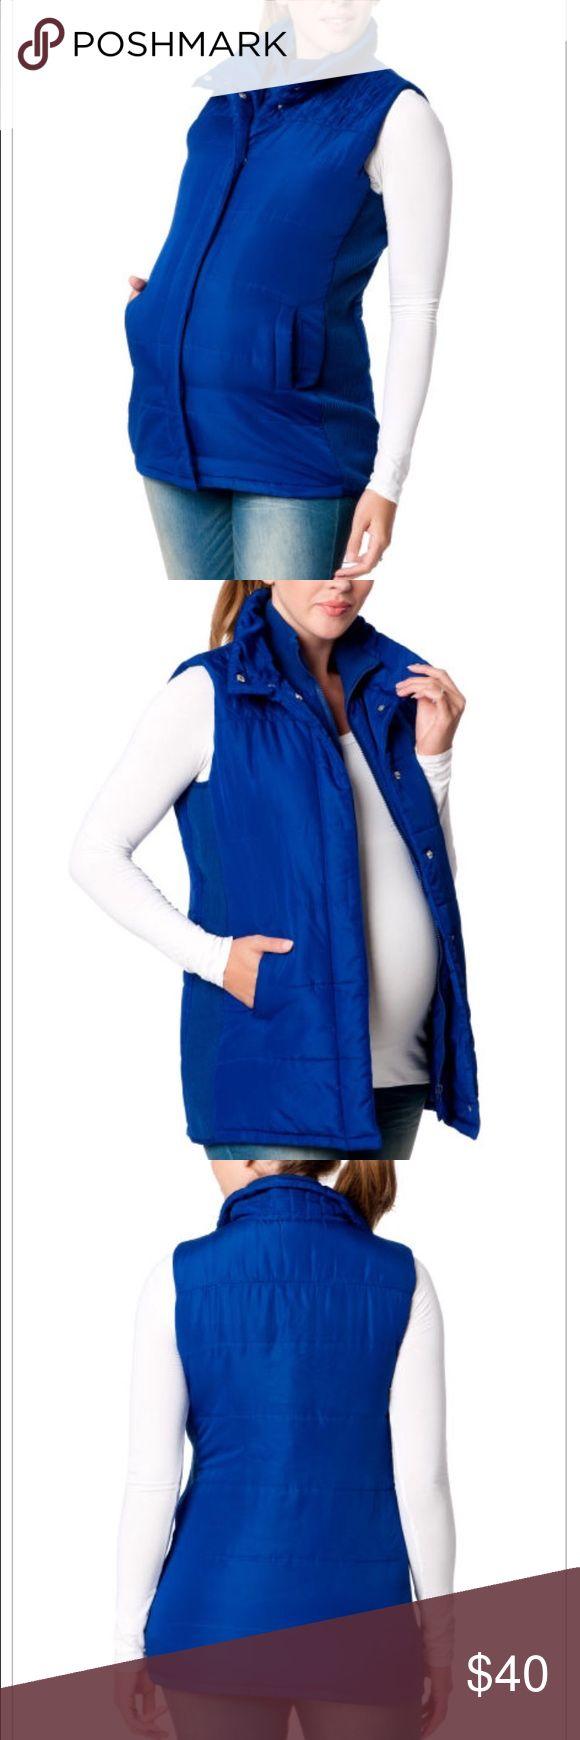 Maternity Vest. NEVER BEEN WORN. Electric Blue Maternity Vest Size Small. Fits like a medium. Motherhood Maternity Jackets & Coats Vests